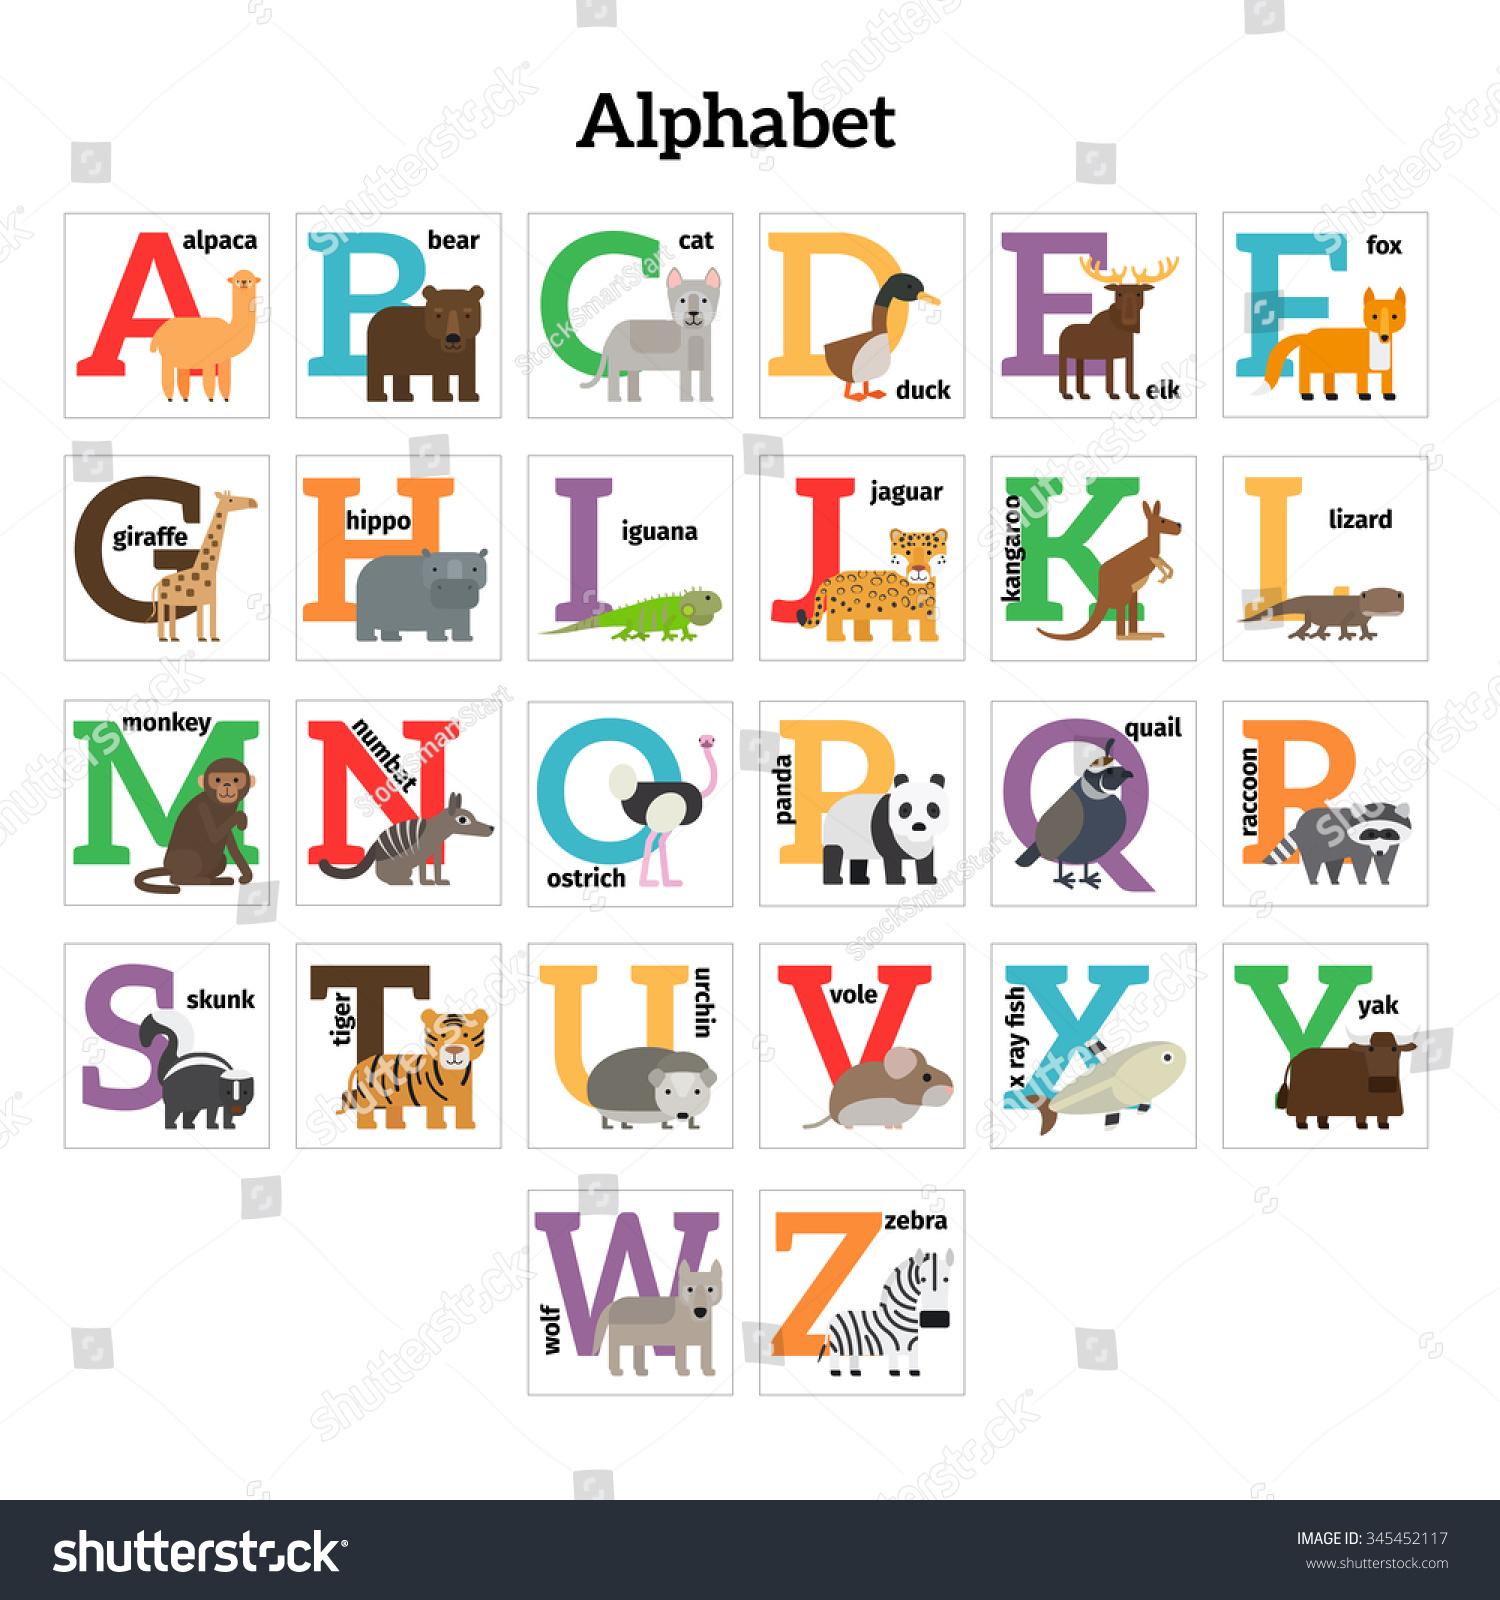 Alphabet preschool - English Animals Zoo Alphabet Preschool Kids Education Vector Illustration